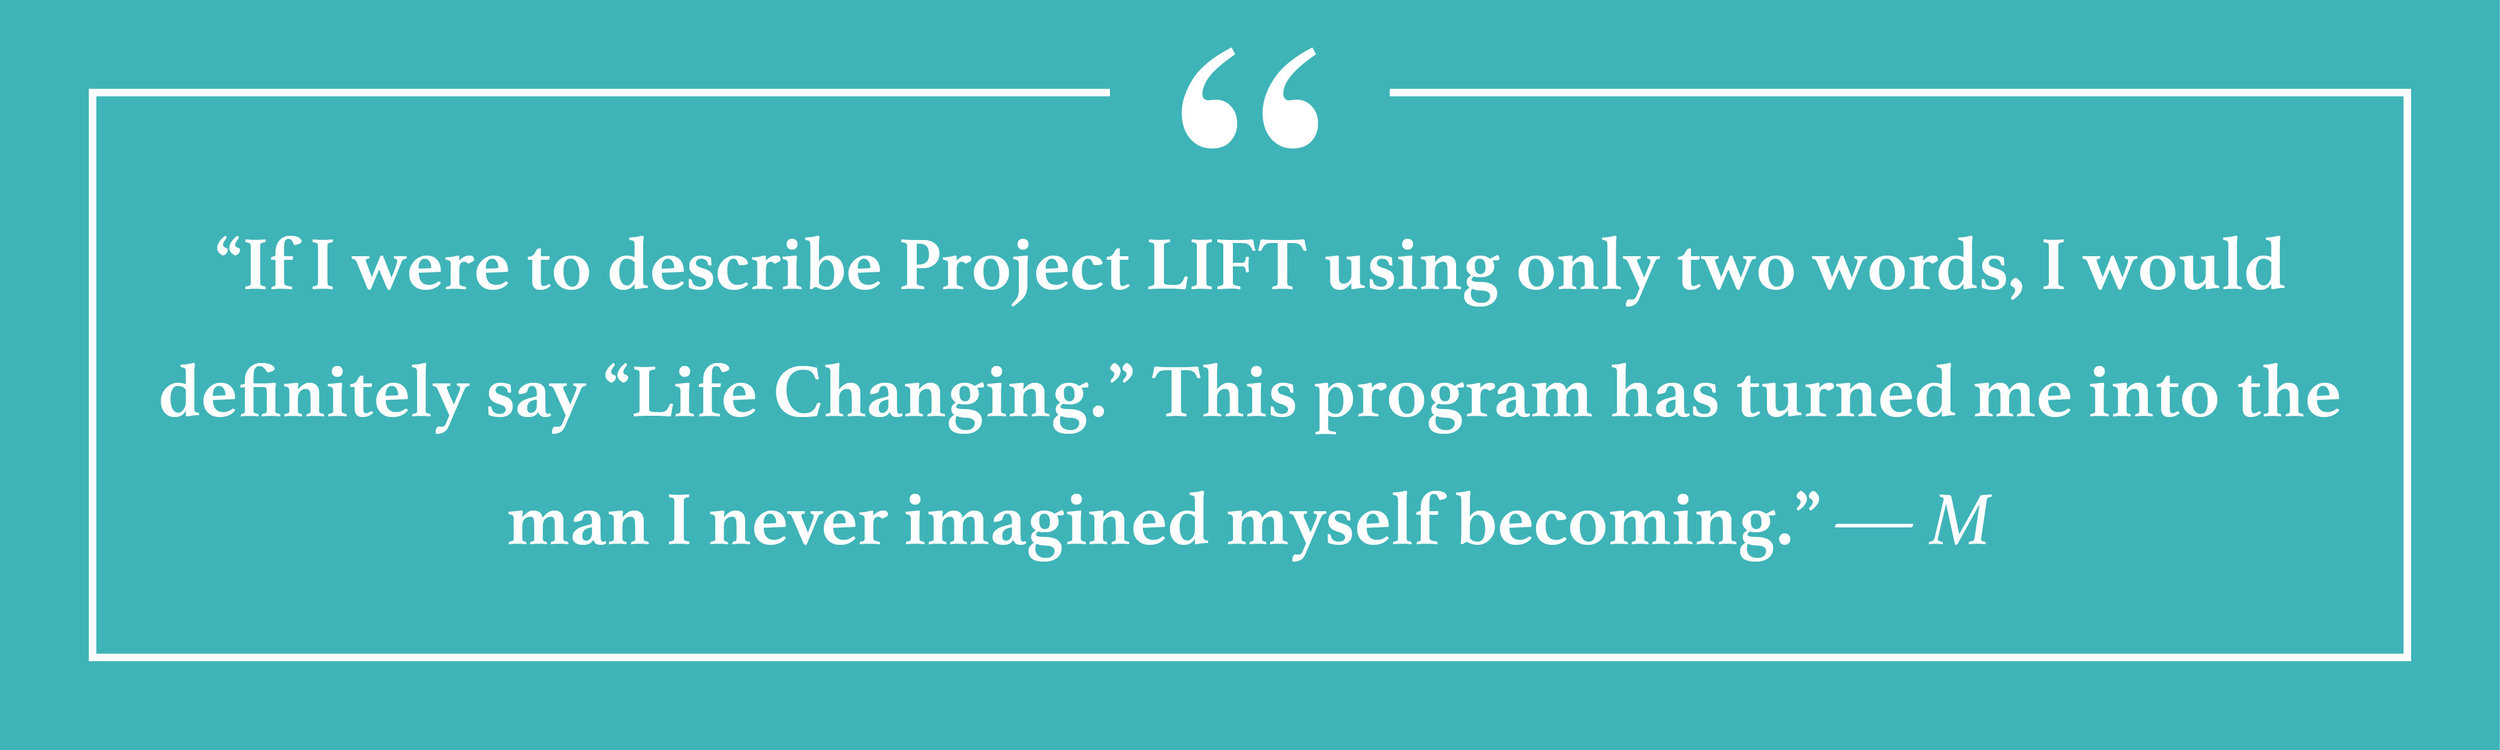 Project-LIFT-Testimonials2.jpg